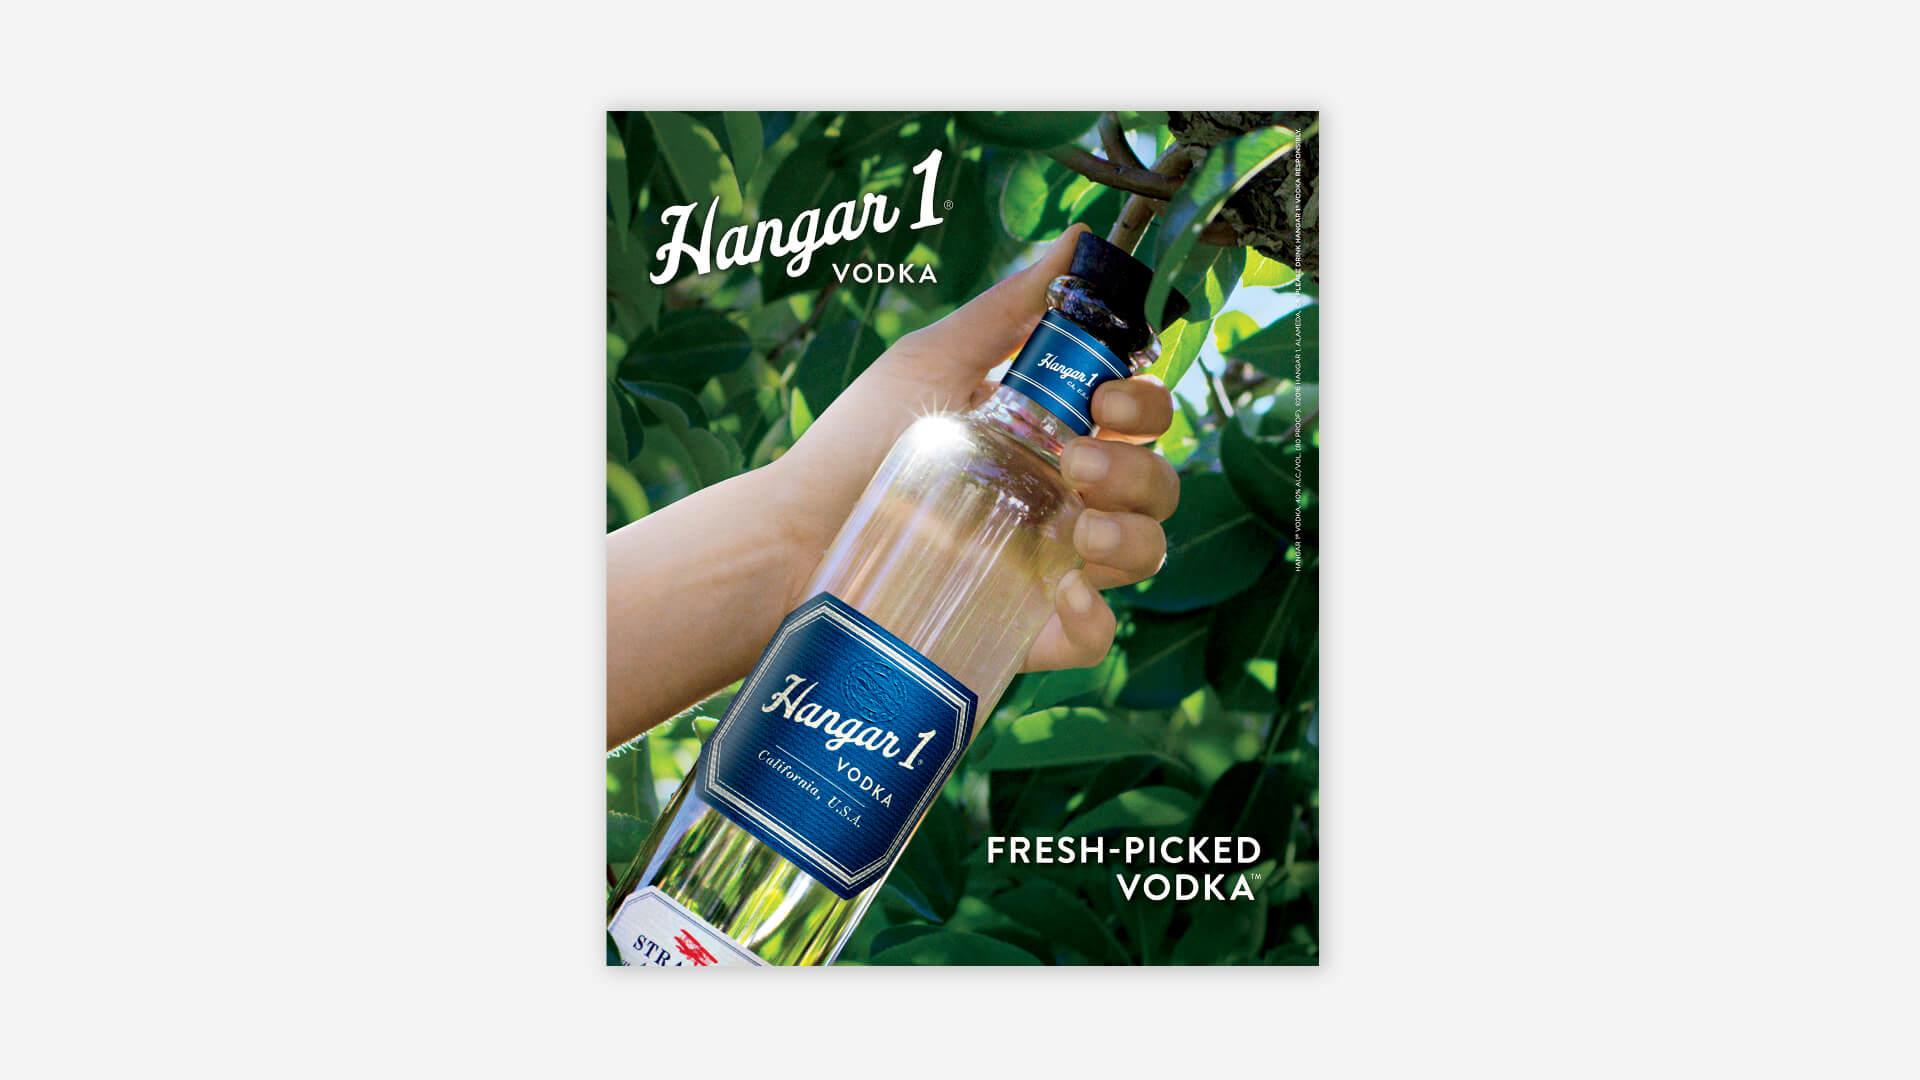 Hangar 1 - Fresh-Picked Vodka